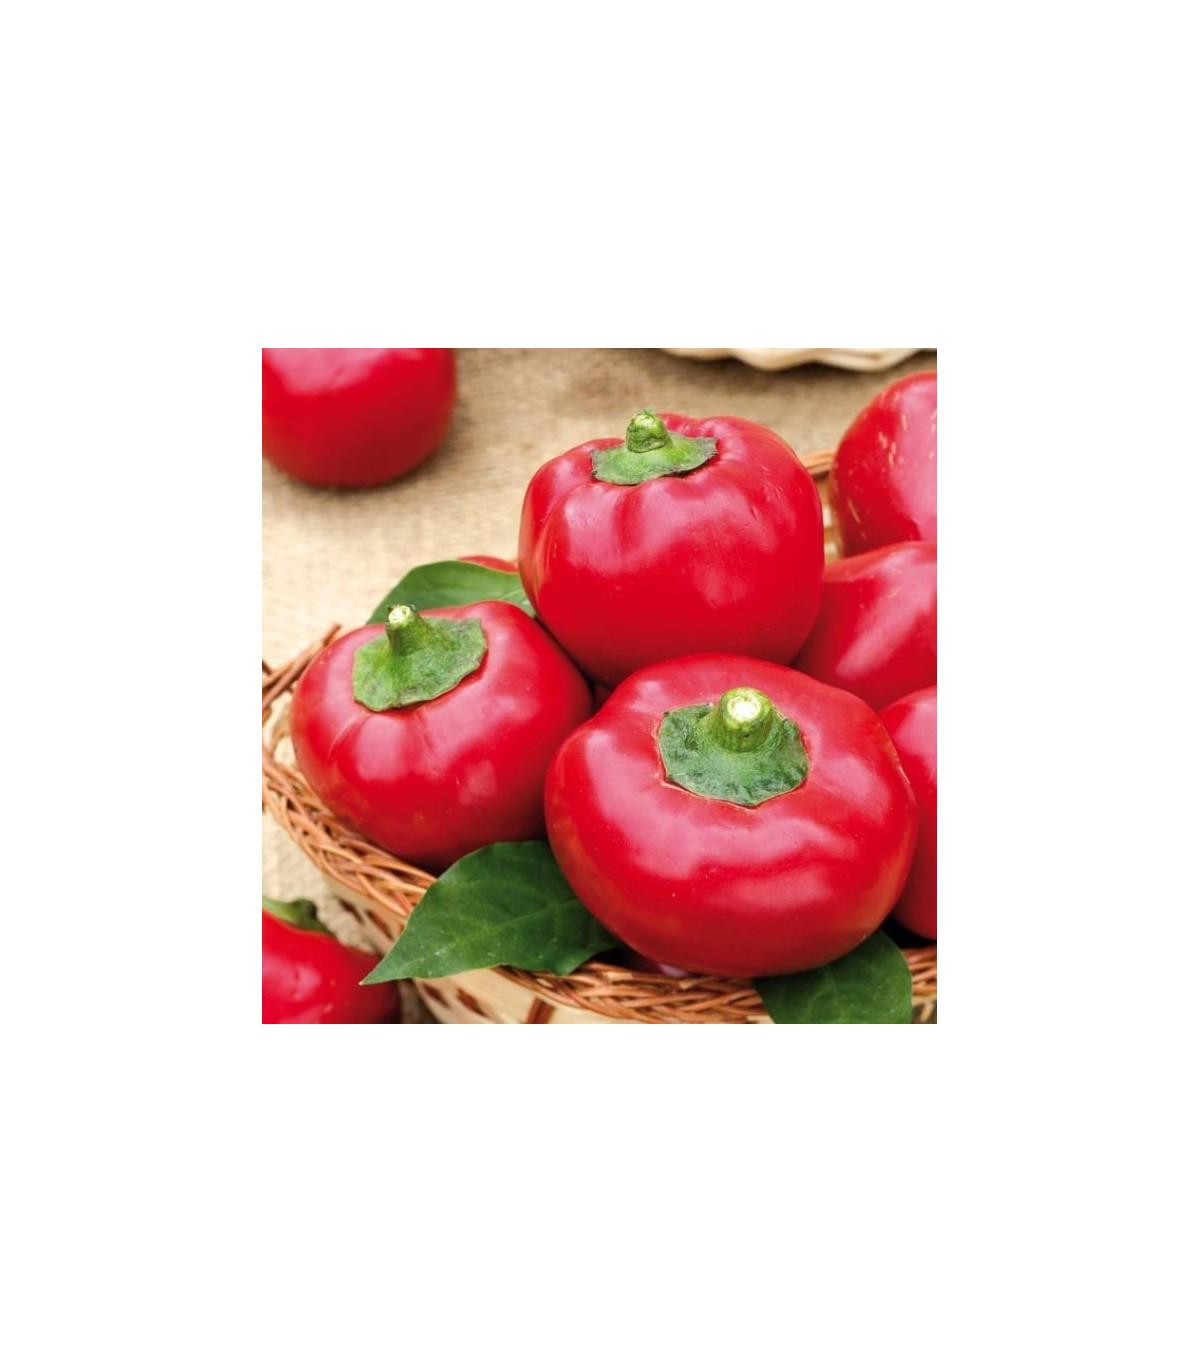 Paradajková paprika Topgirl - Capsicum annuum - 7 ks